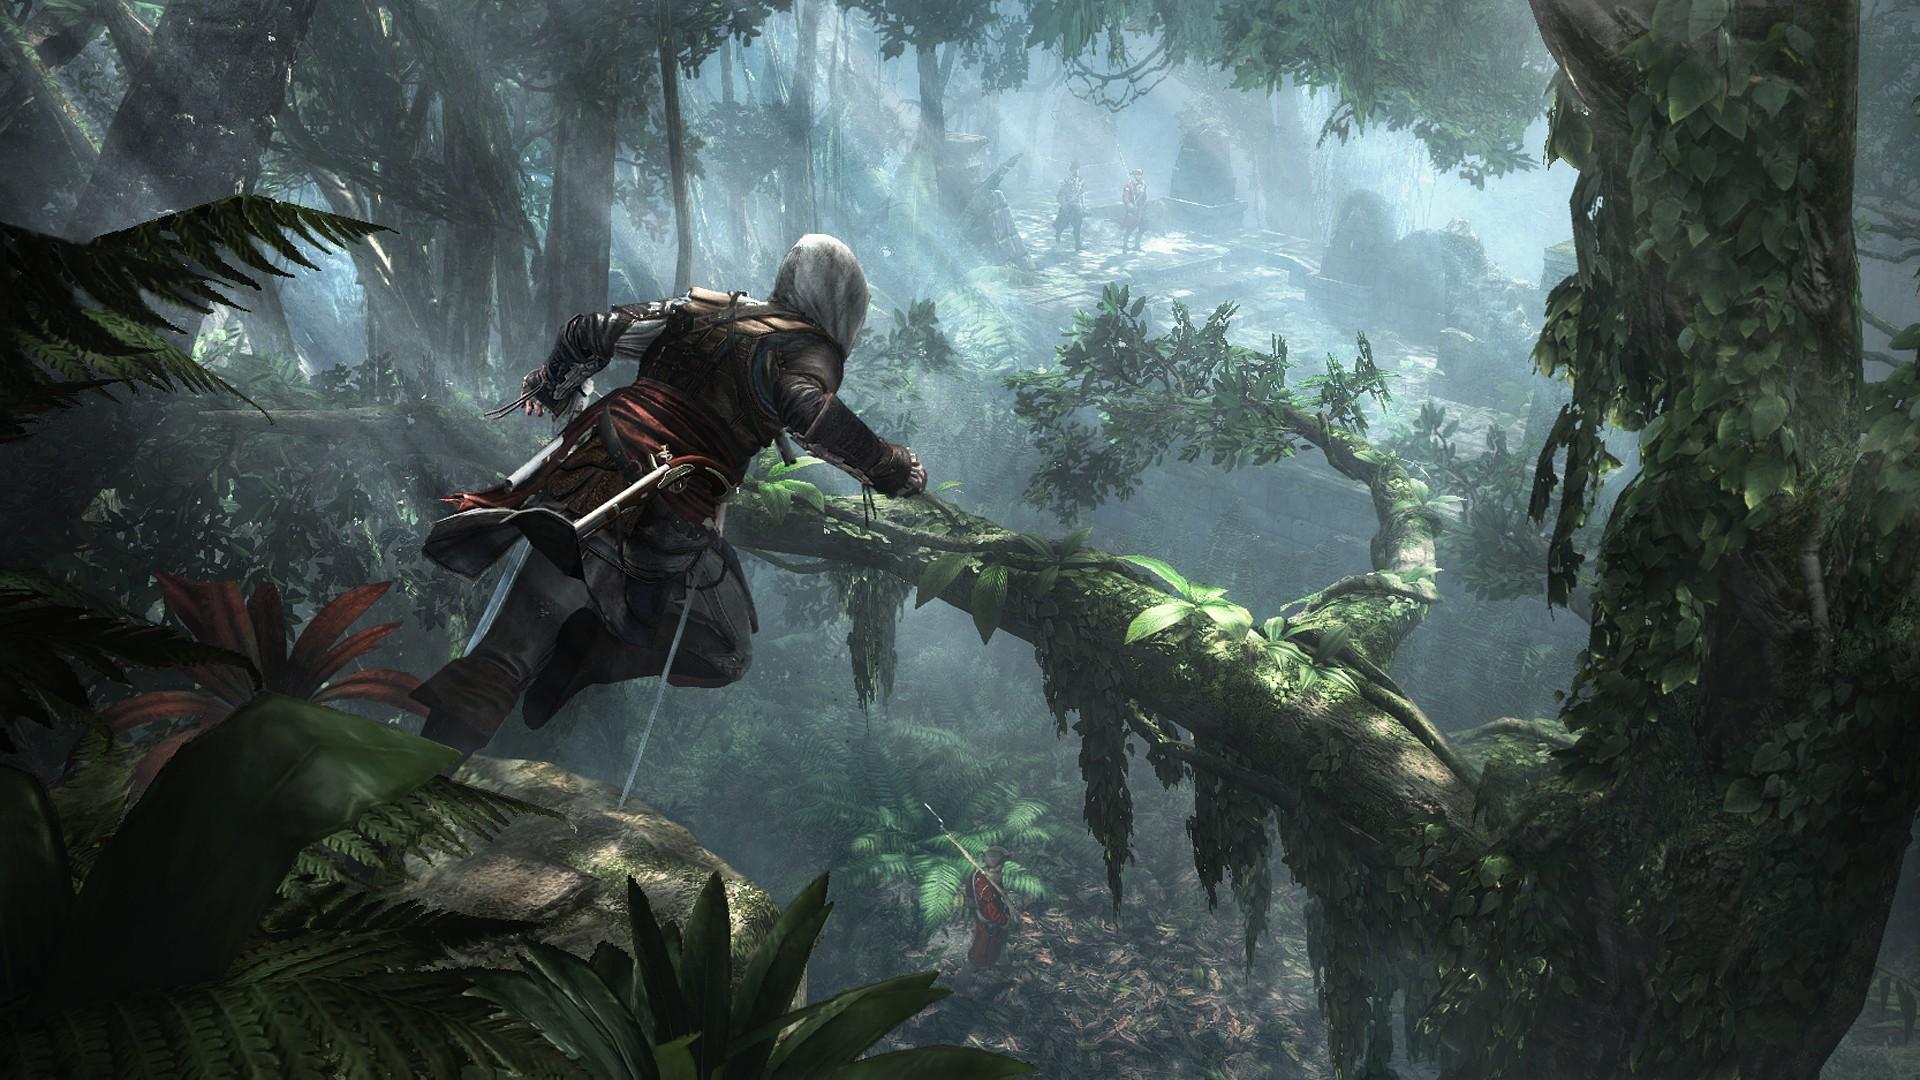 Reseña: Assassin's Creed IV: Black Flag [PS4] 12800151083_9f94870526_o